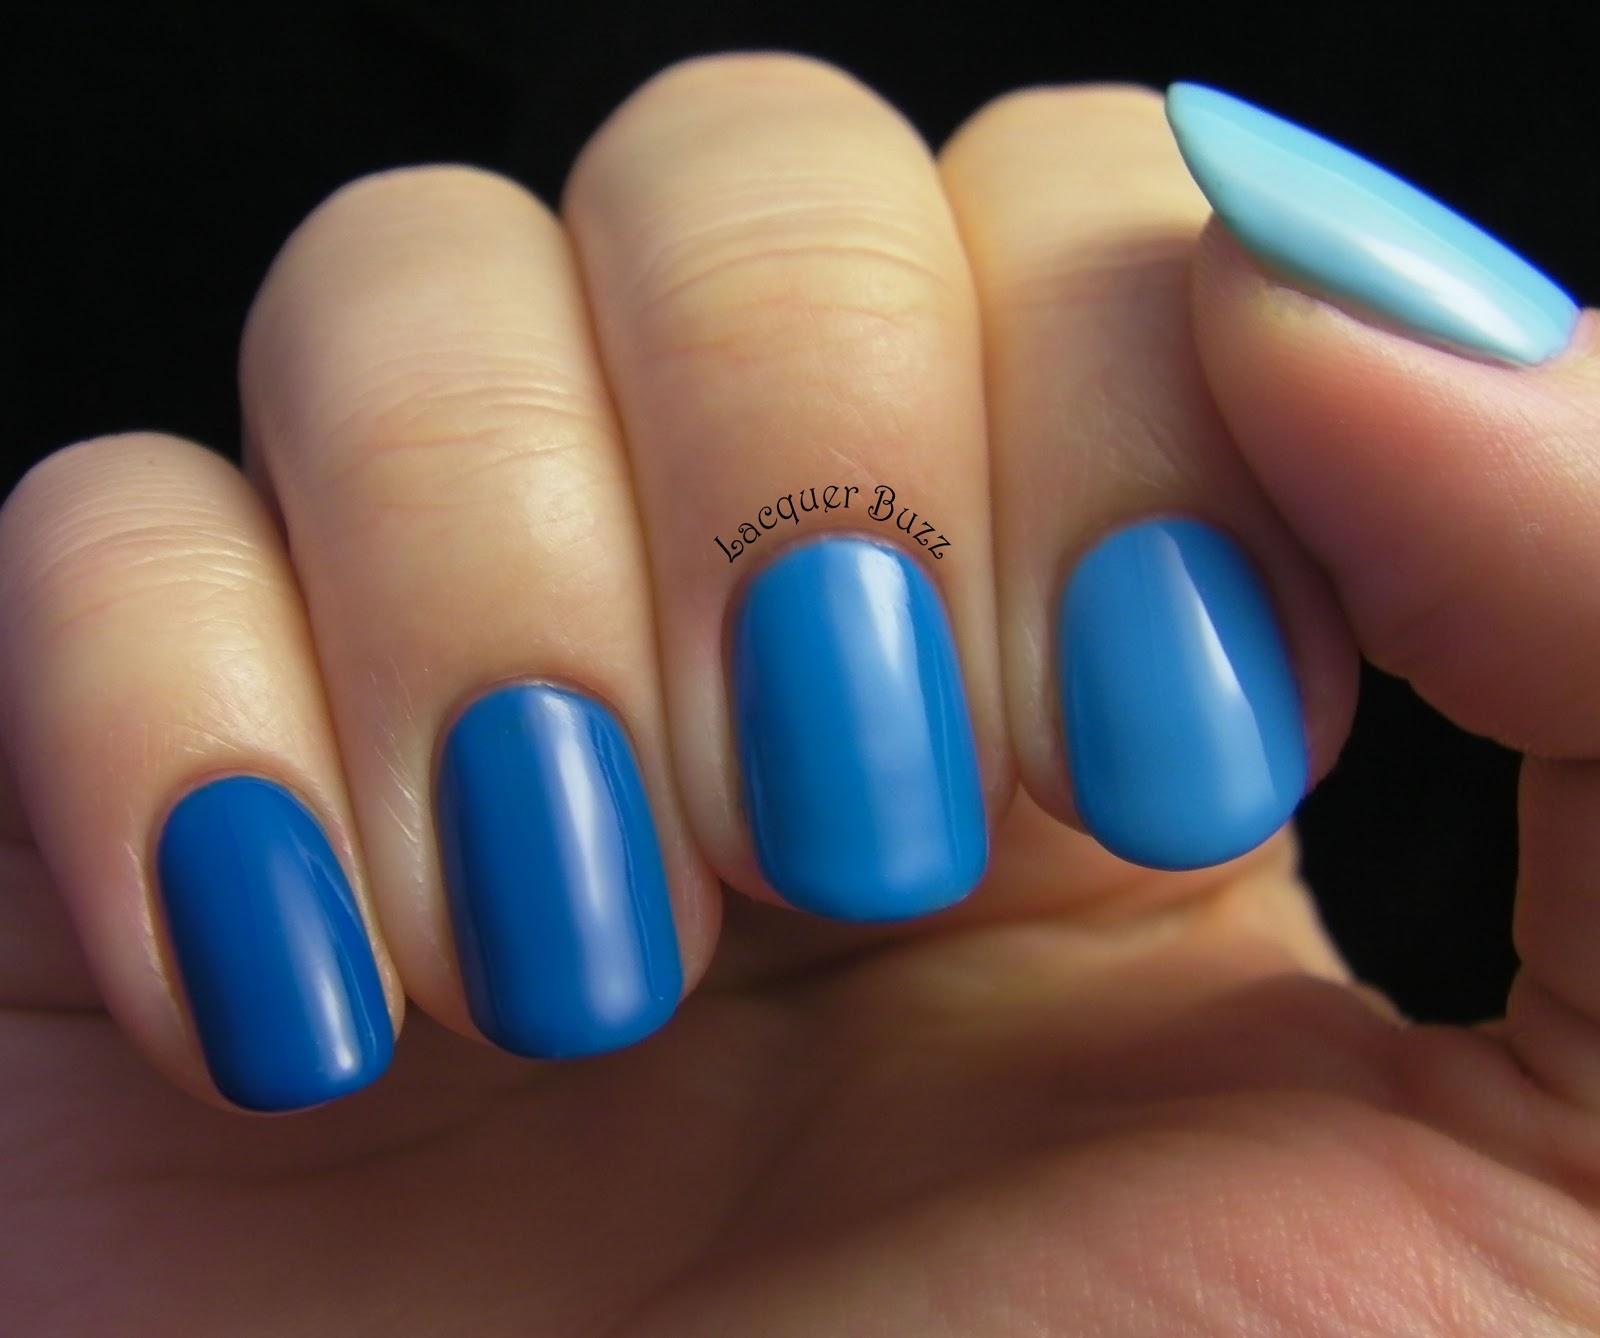 Lacquer Buzz: Monday Blues: Ombre Nails